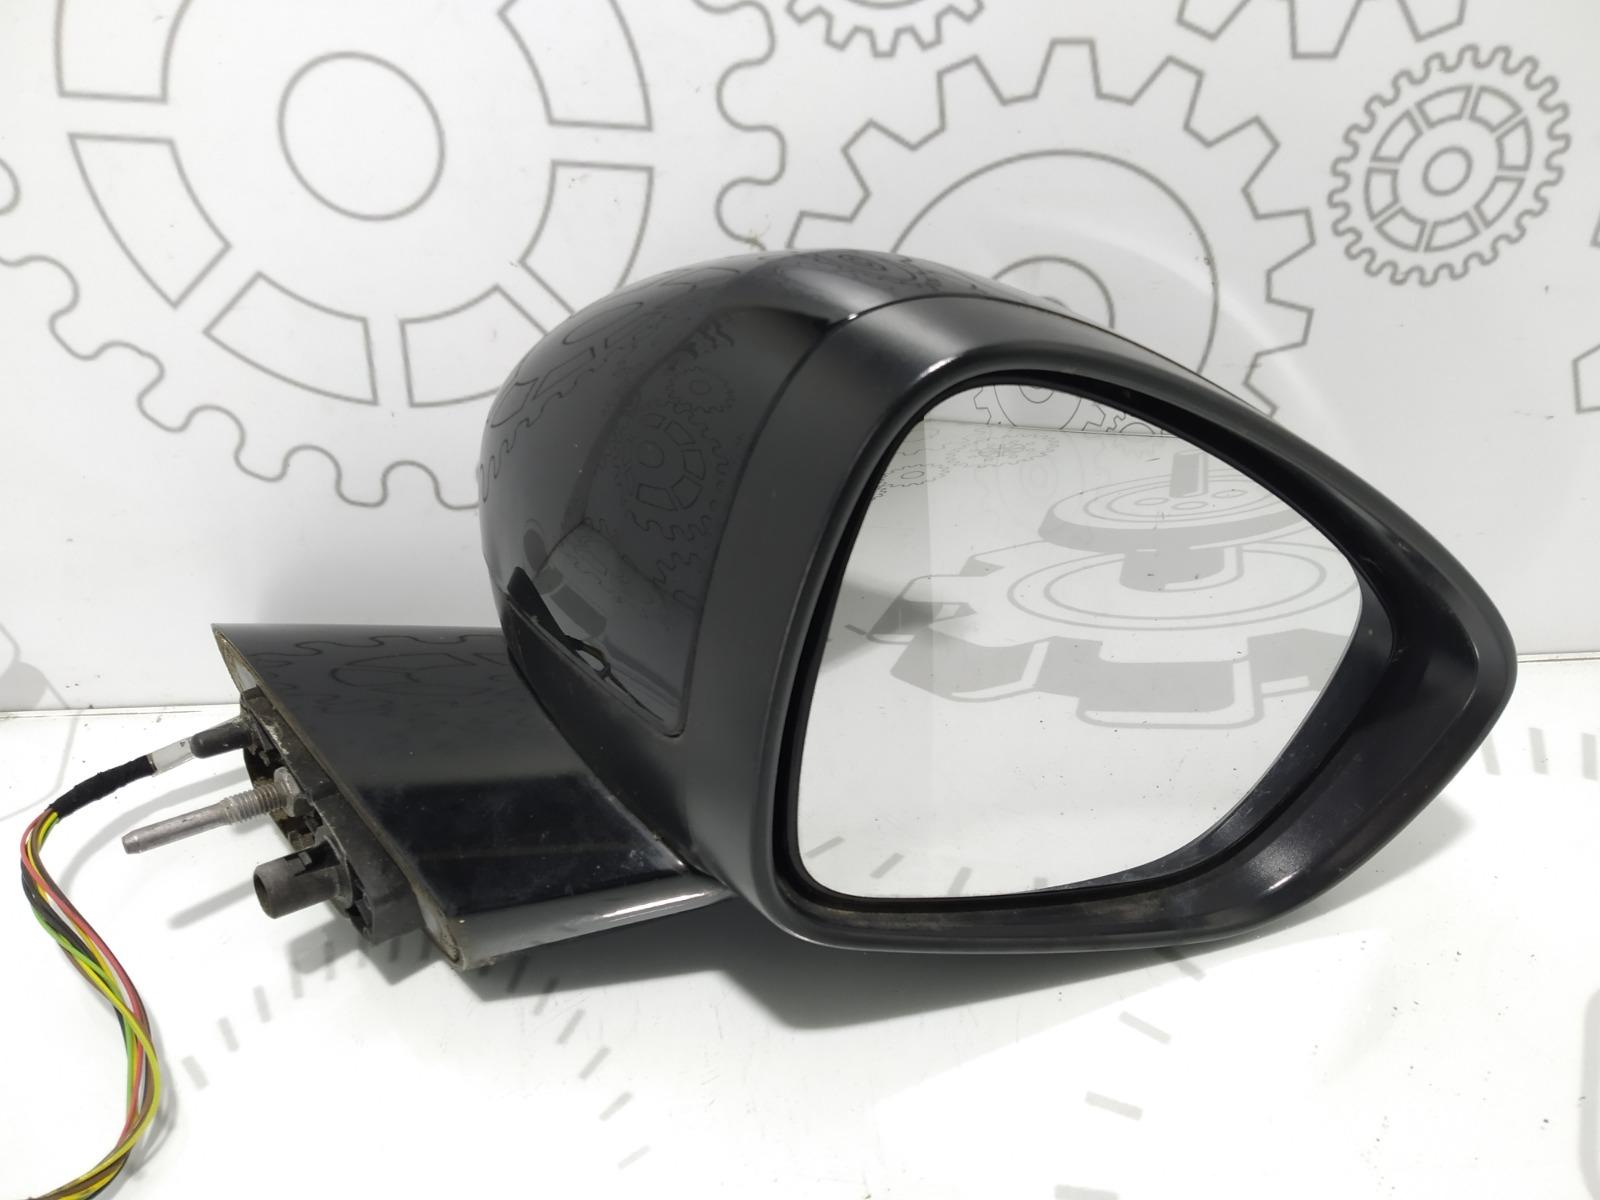 Зеркало наружное правое Citroen C4 Grand Picasso 1.6 HDI 2014 (б/у)